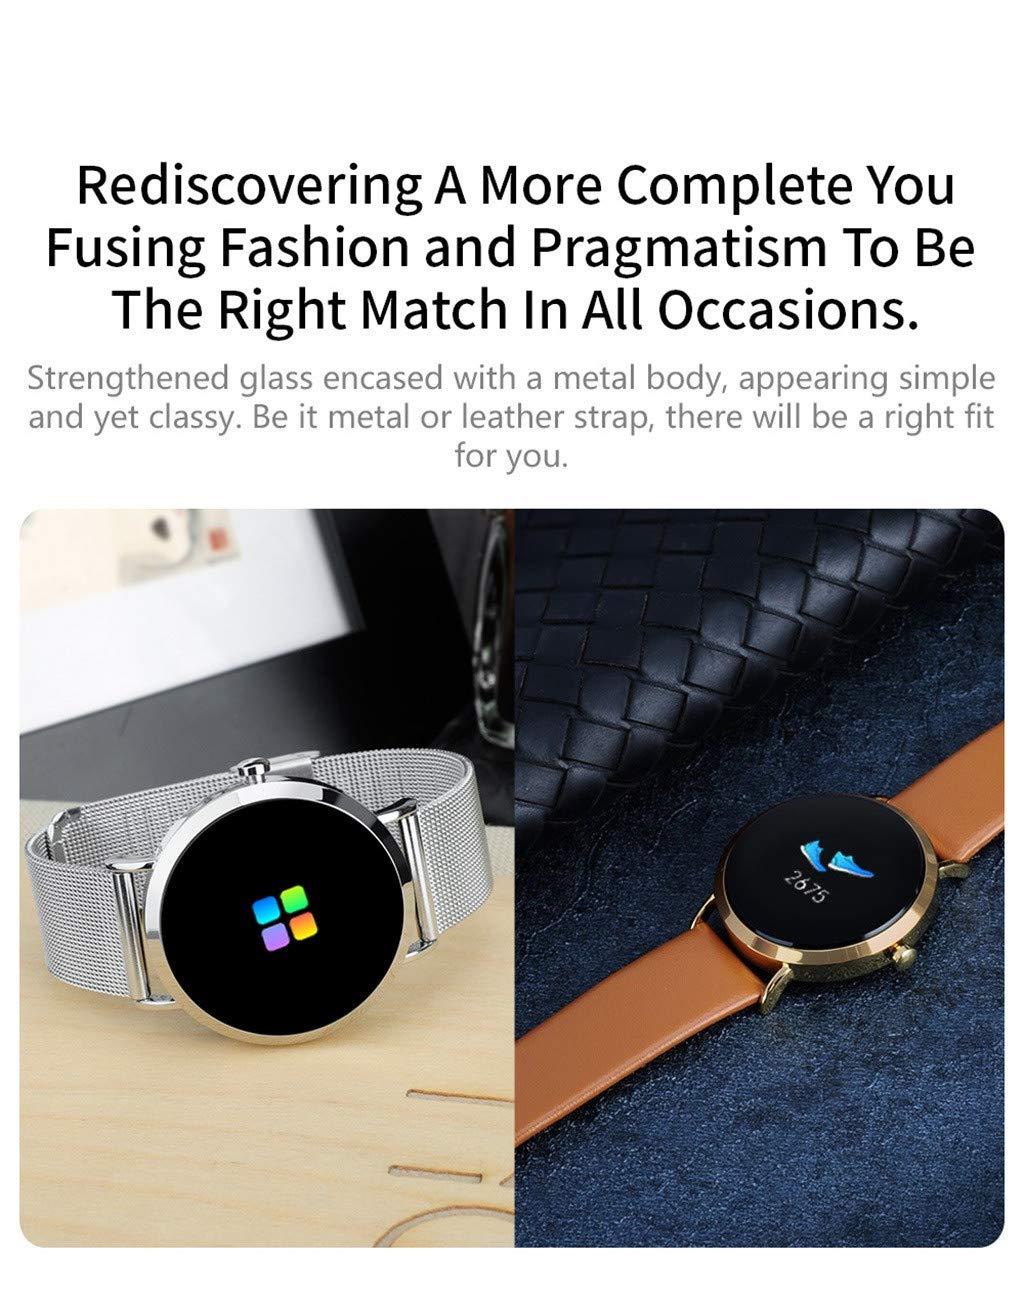 Blood Pressure Smart Watch Hot Sale, NDGDA Heart Rate Sleep Monitoring Sport Smart Watch Bracelet Fitness Wristband (D) by NDGDA Smart Watch (Image #2)